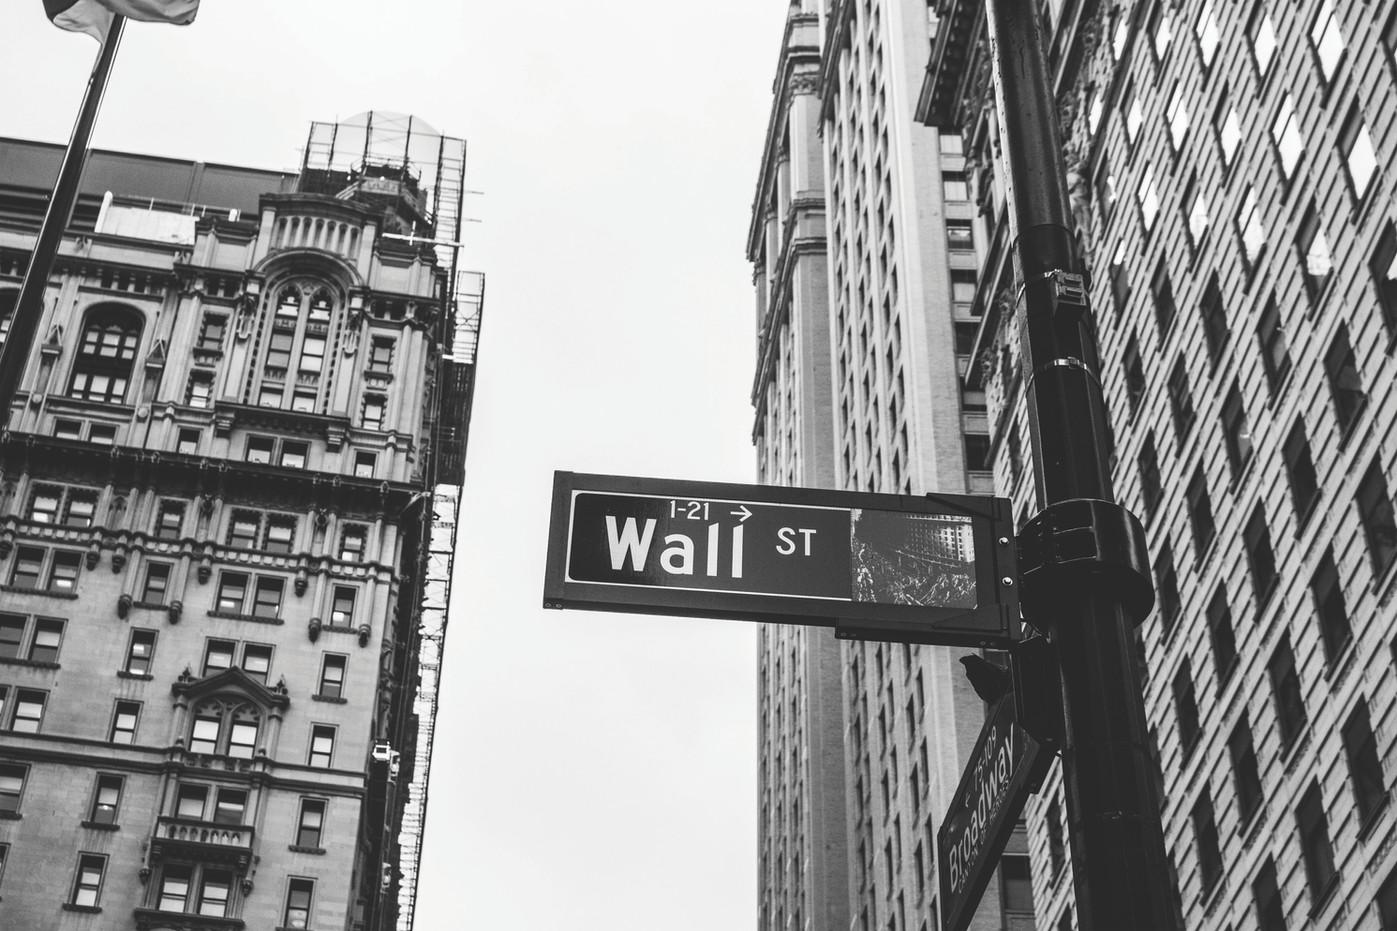 Wall street name